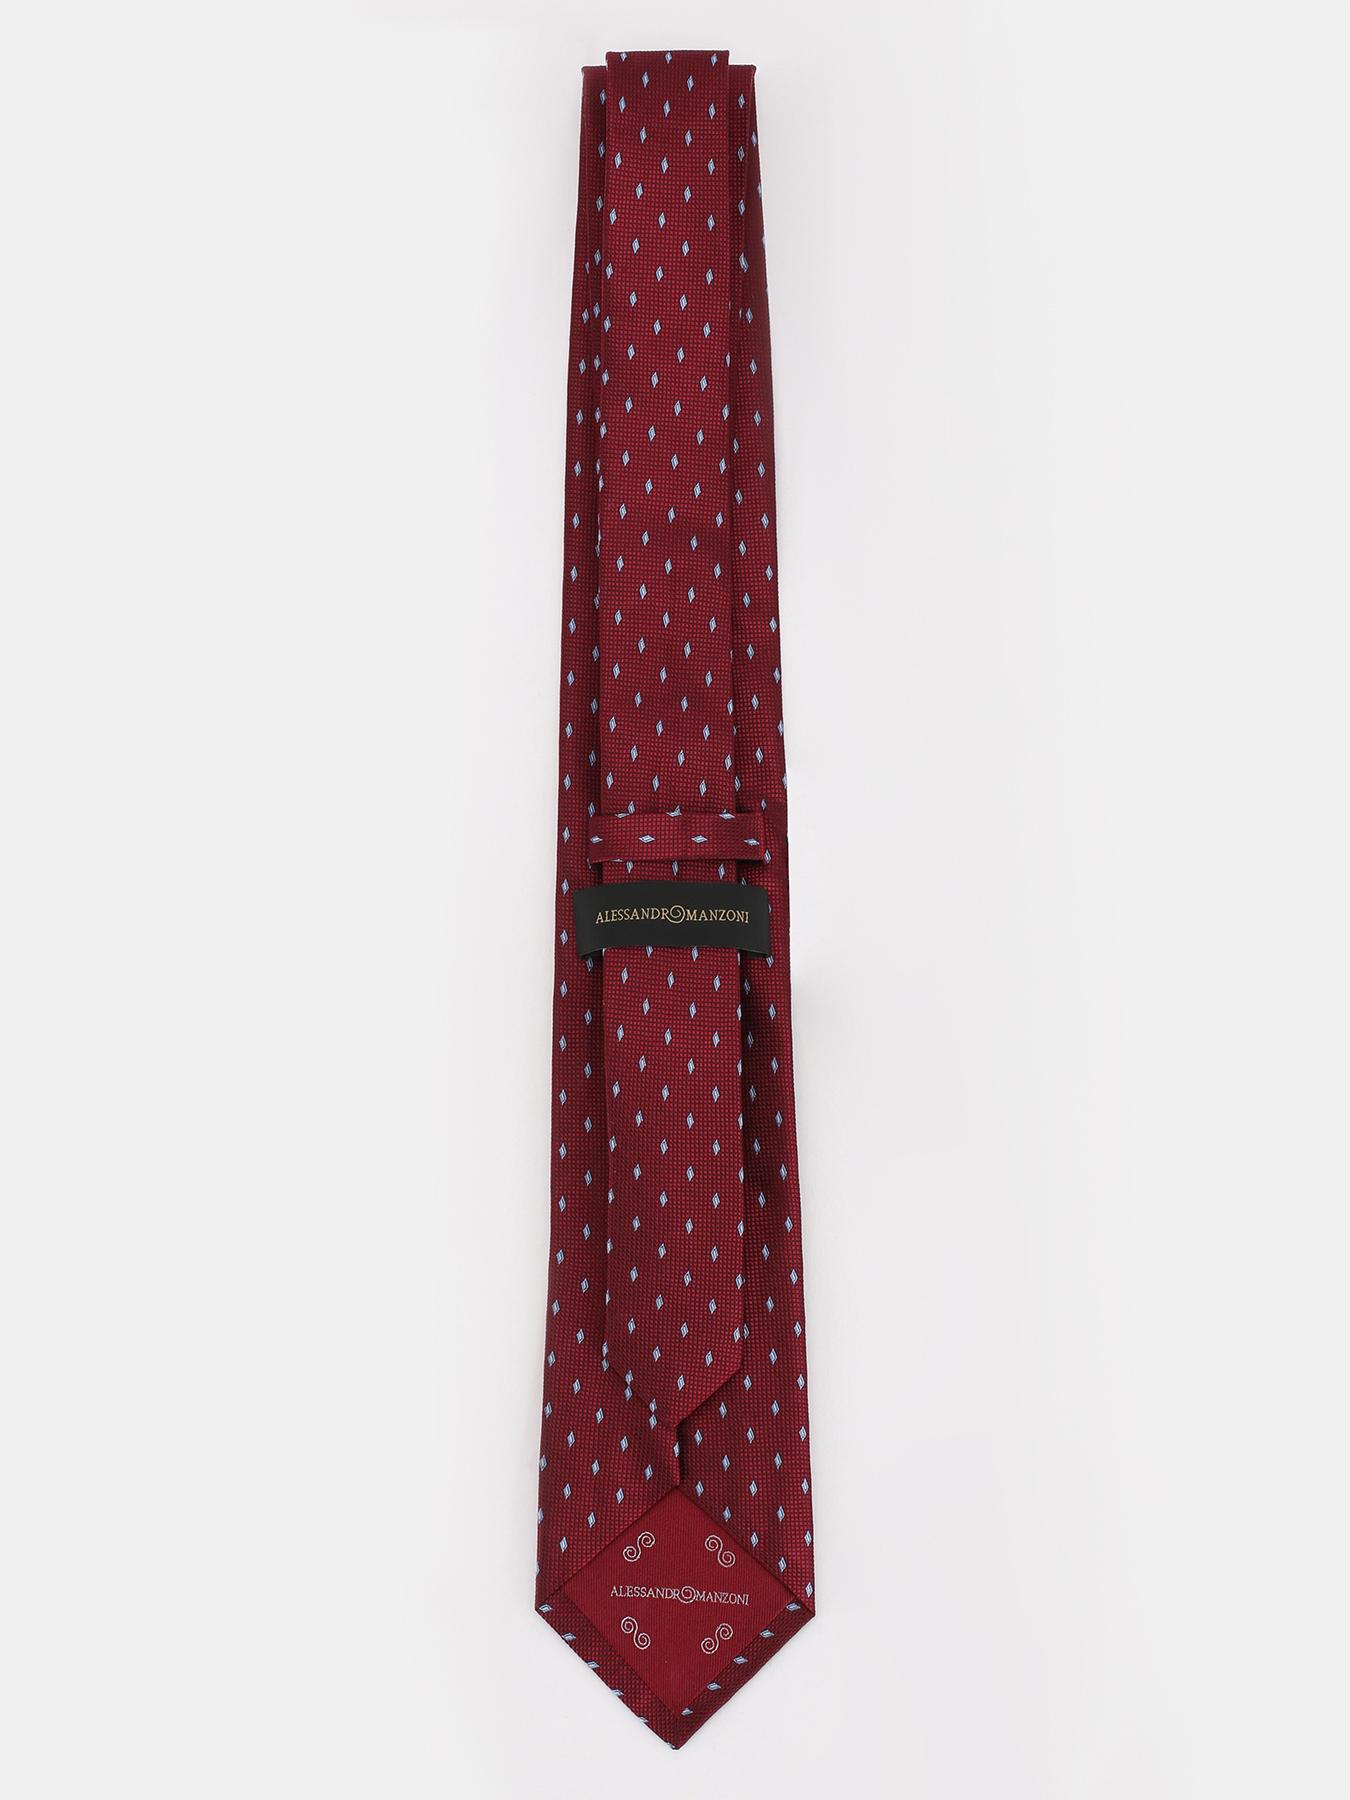 Alessandro Manzoni Шелковый галстук с узорами 324187-185 Фото 2